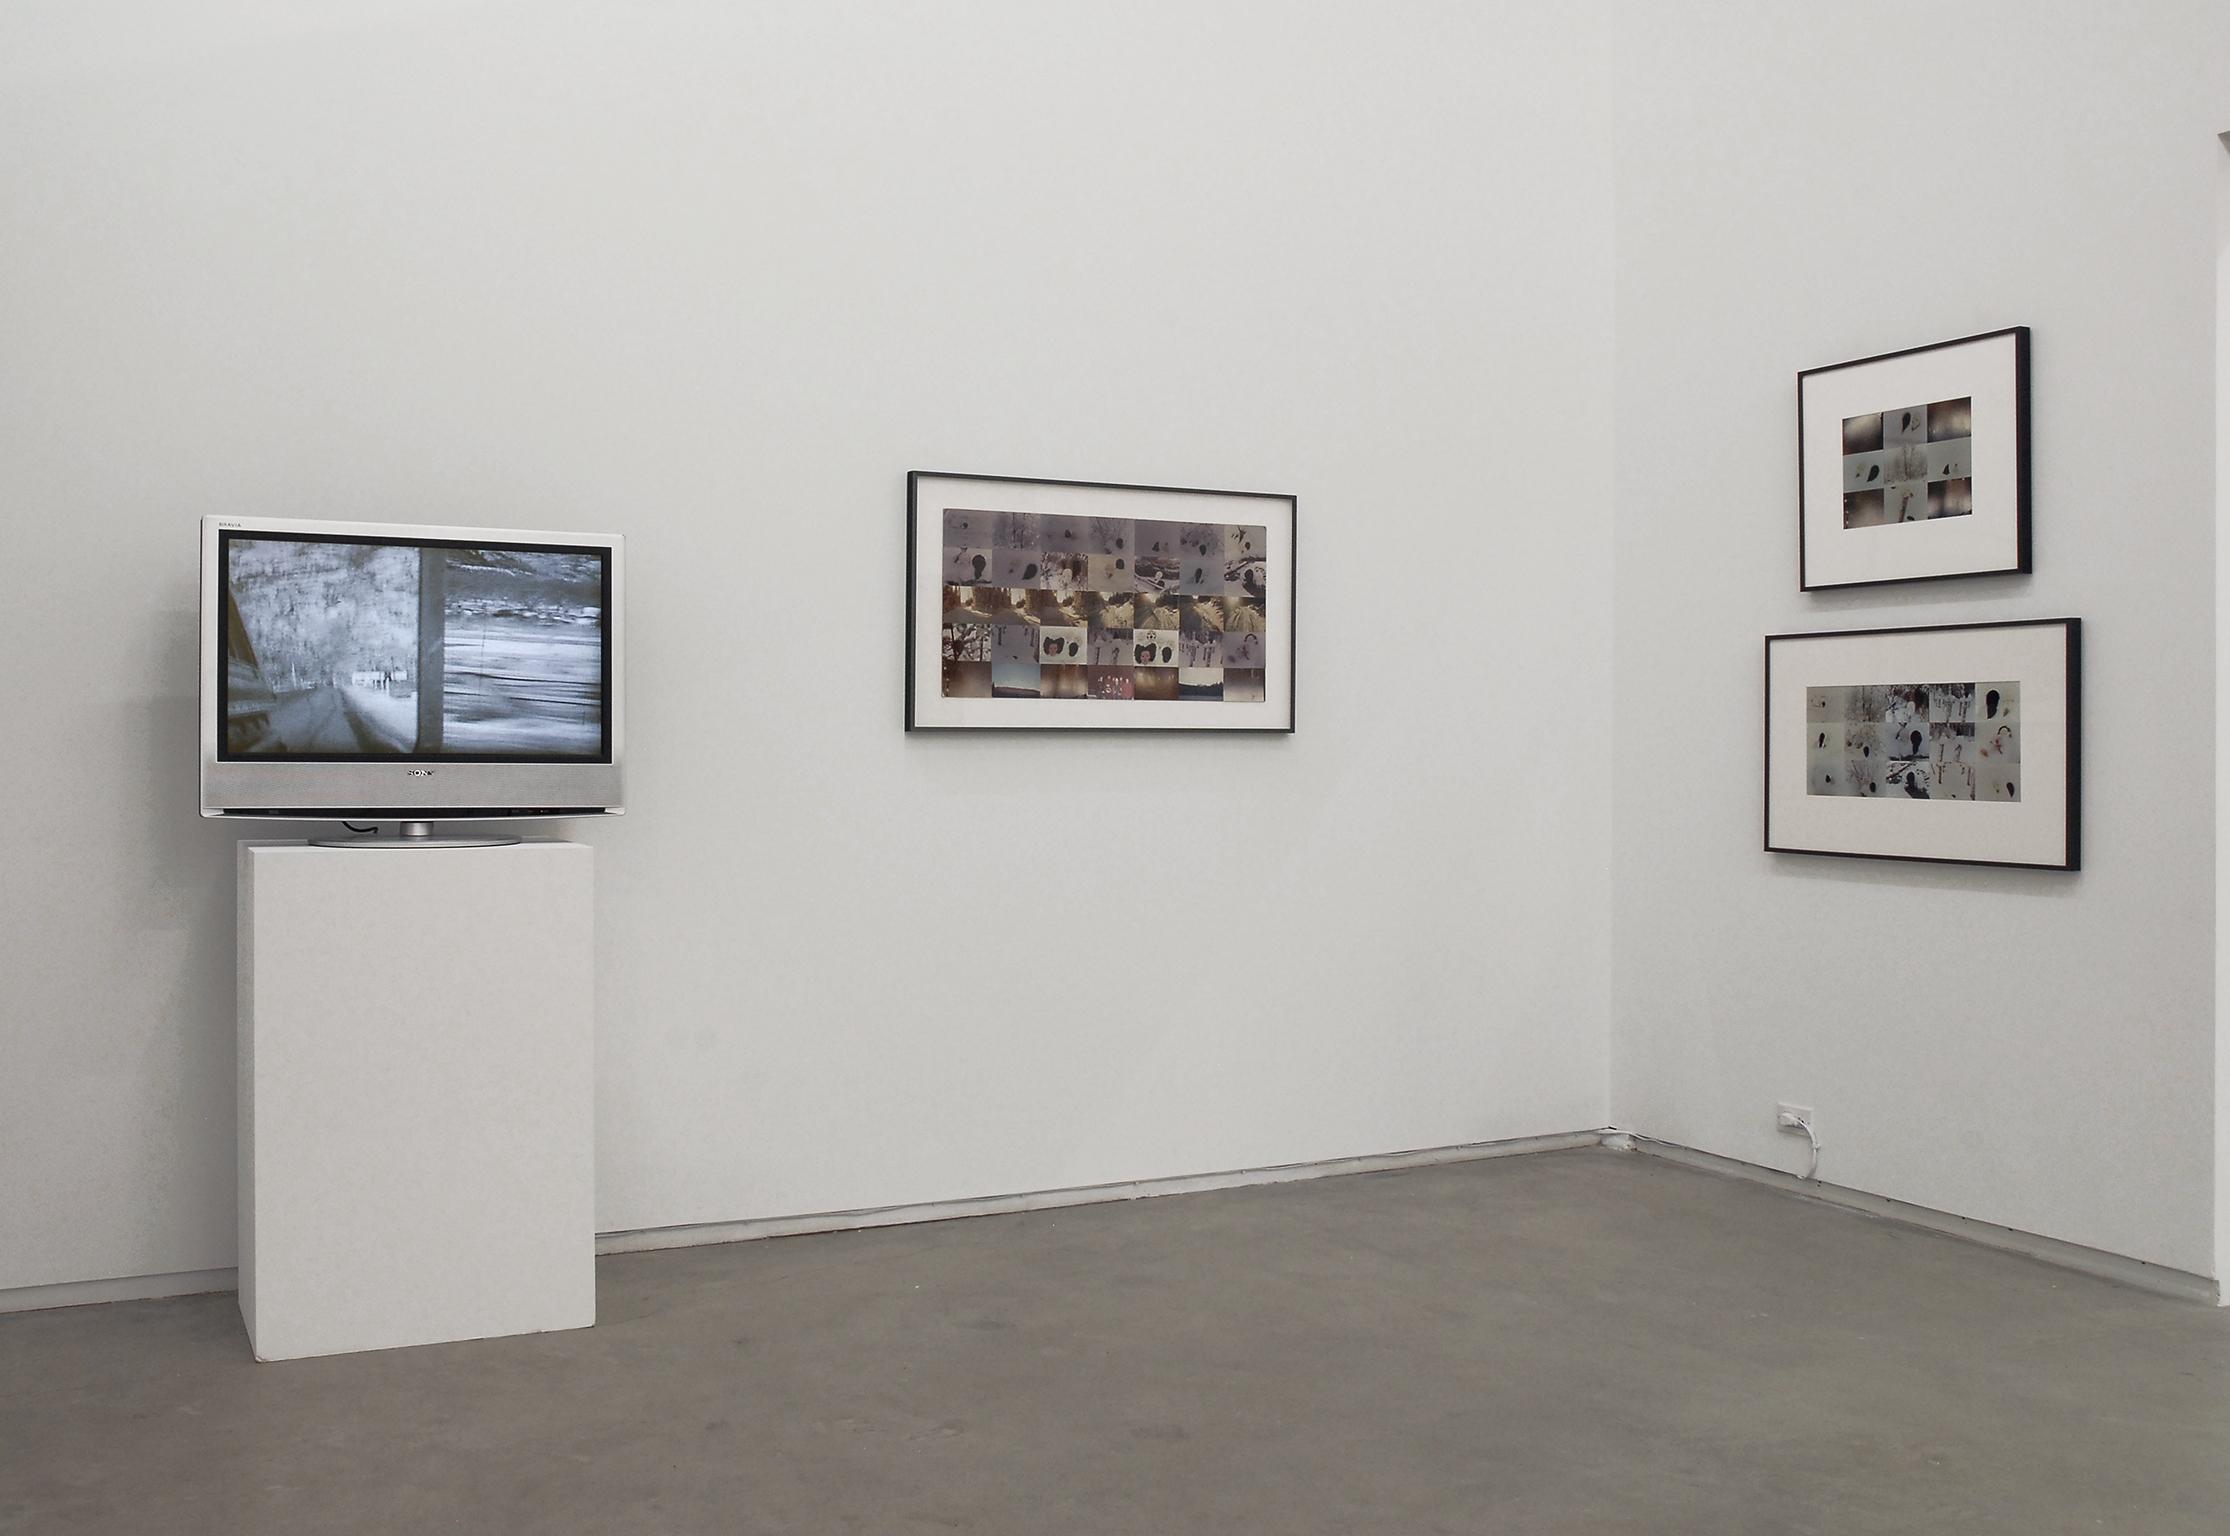 Roy Kiyooka, installation view, Process as Work, Catriona Jeffries, 2008 by